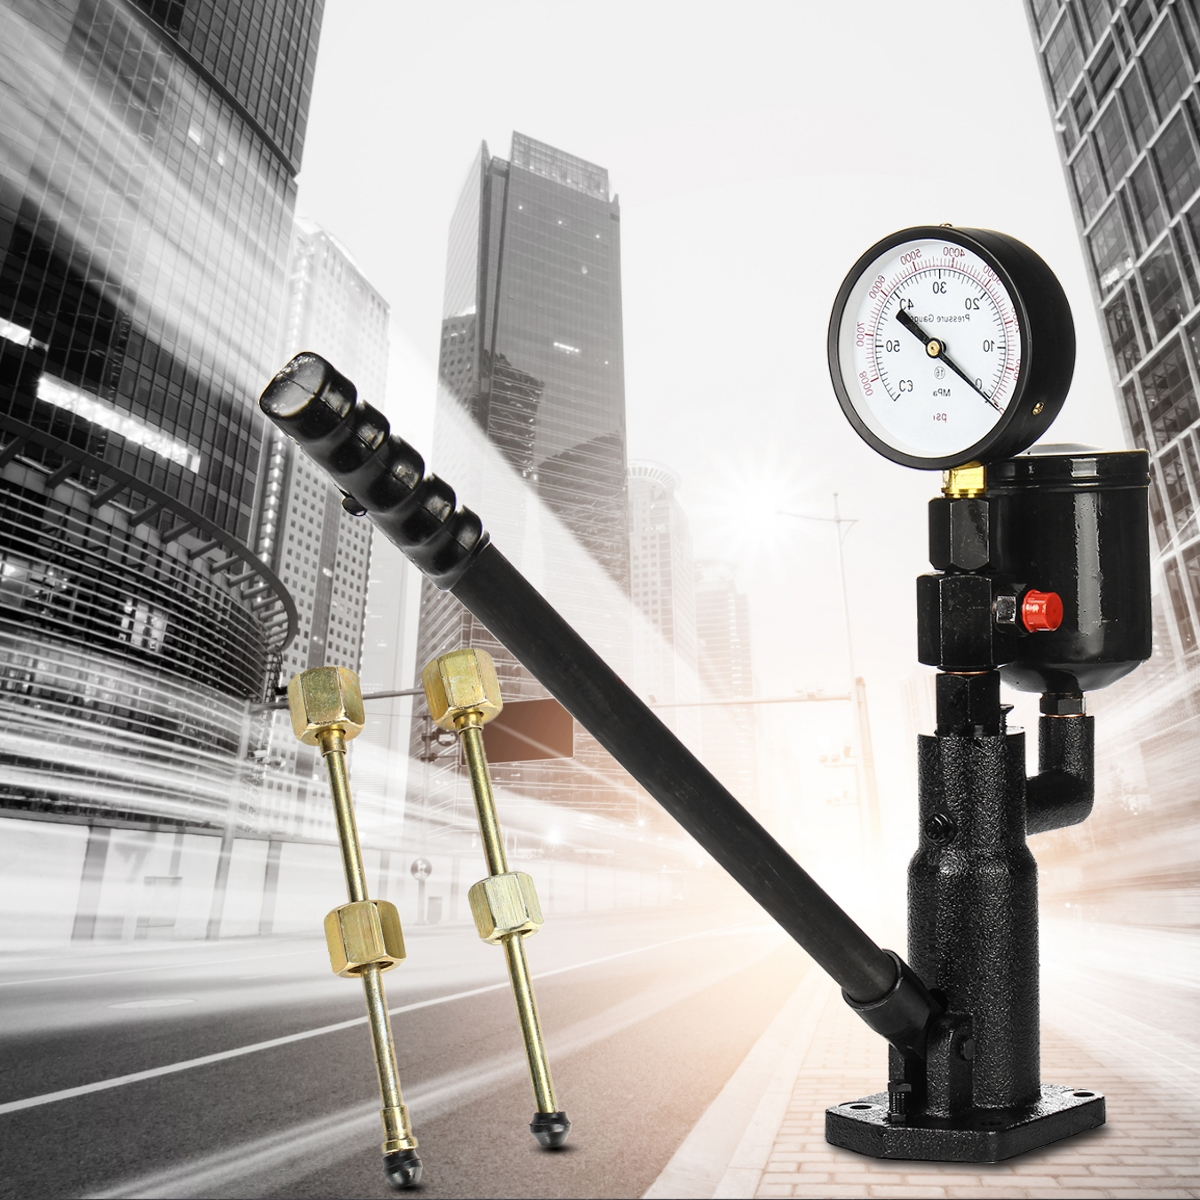 Diesel/Injector Nozzle Pressure Tester 1L Pop Dual Scale Read Gauge Bar/PSI 0-60Mpa Steel Black High Pressure Pipe Diagnostic цены